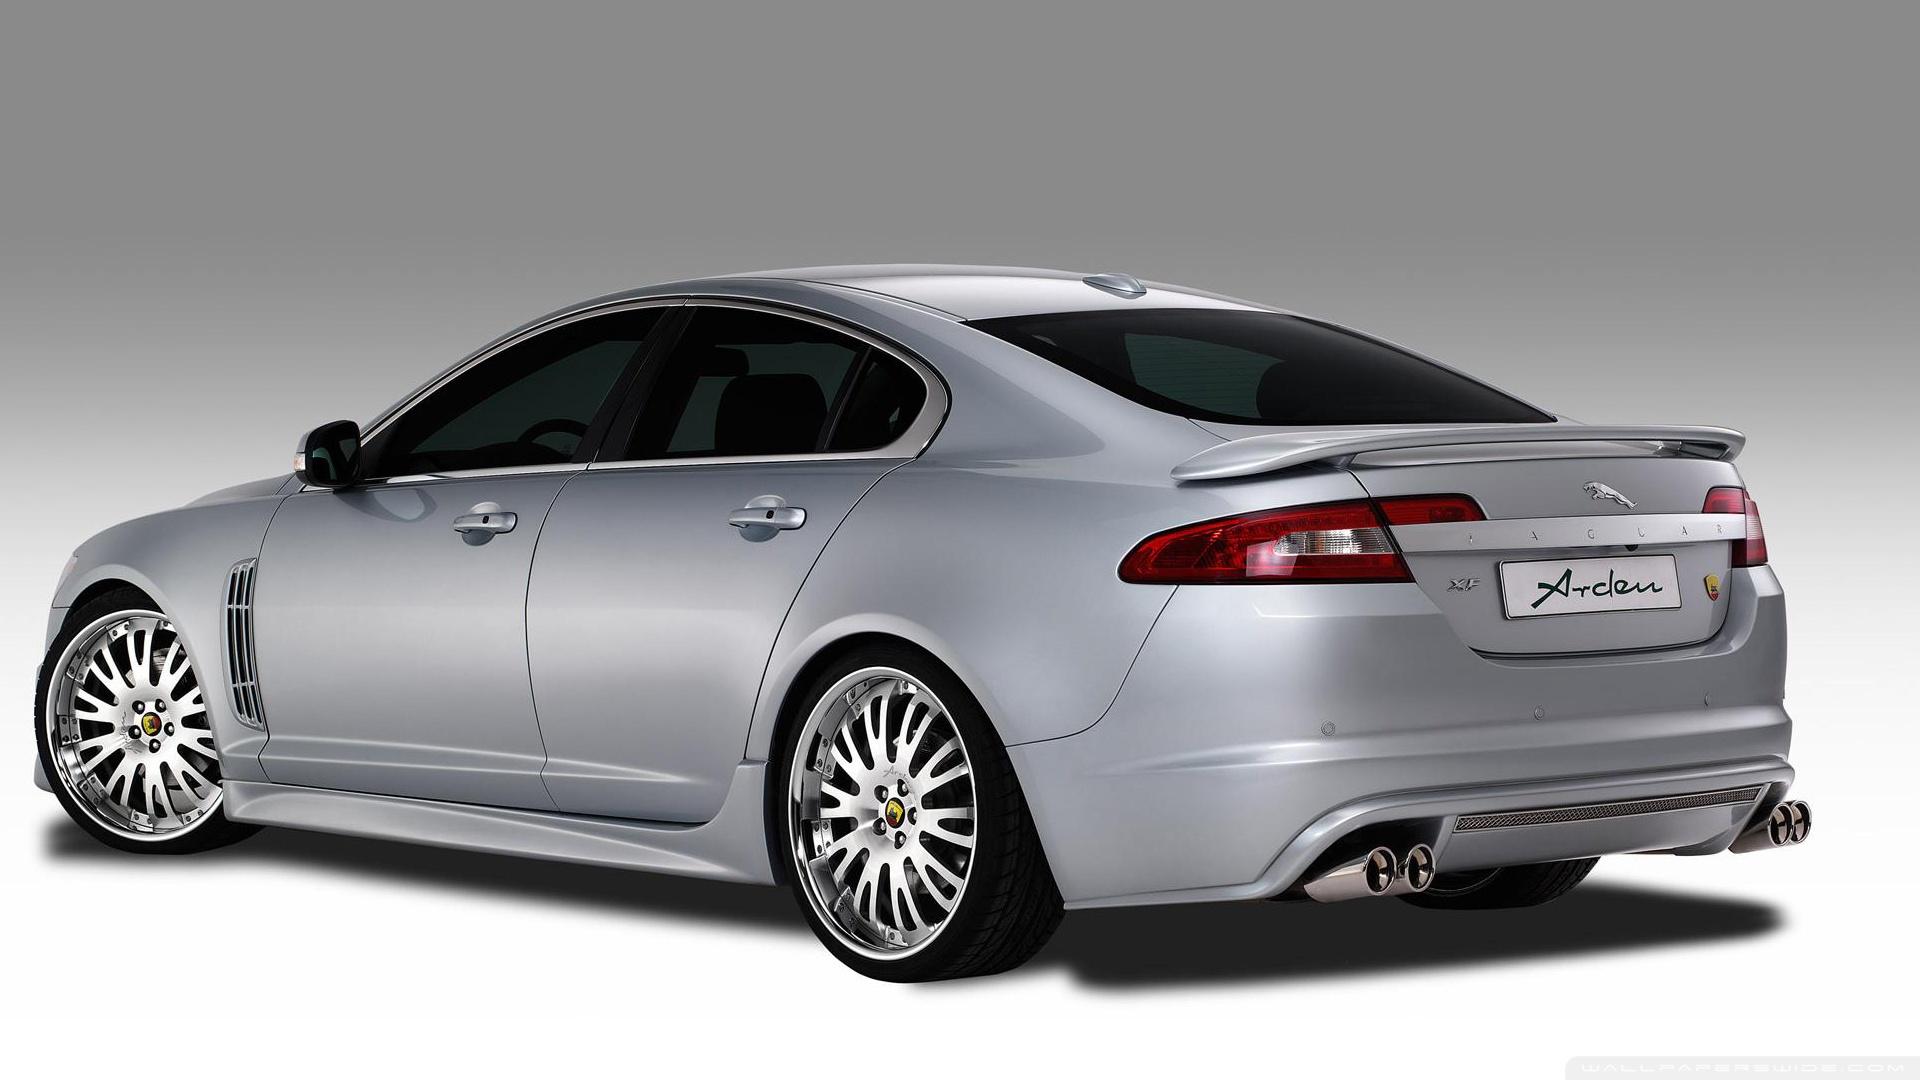 Jaguar Xfr 3d Hd Wallpapers 1080p Jaguar Xf Arden Car 4k Hd Desktop Wallpaper For 4k Ultra